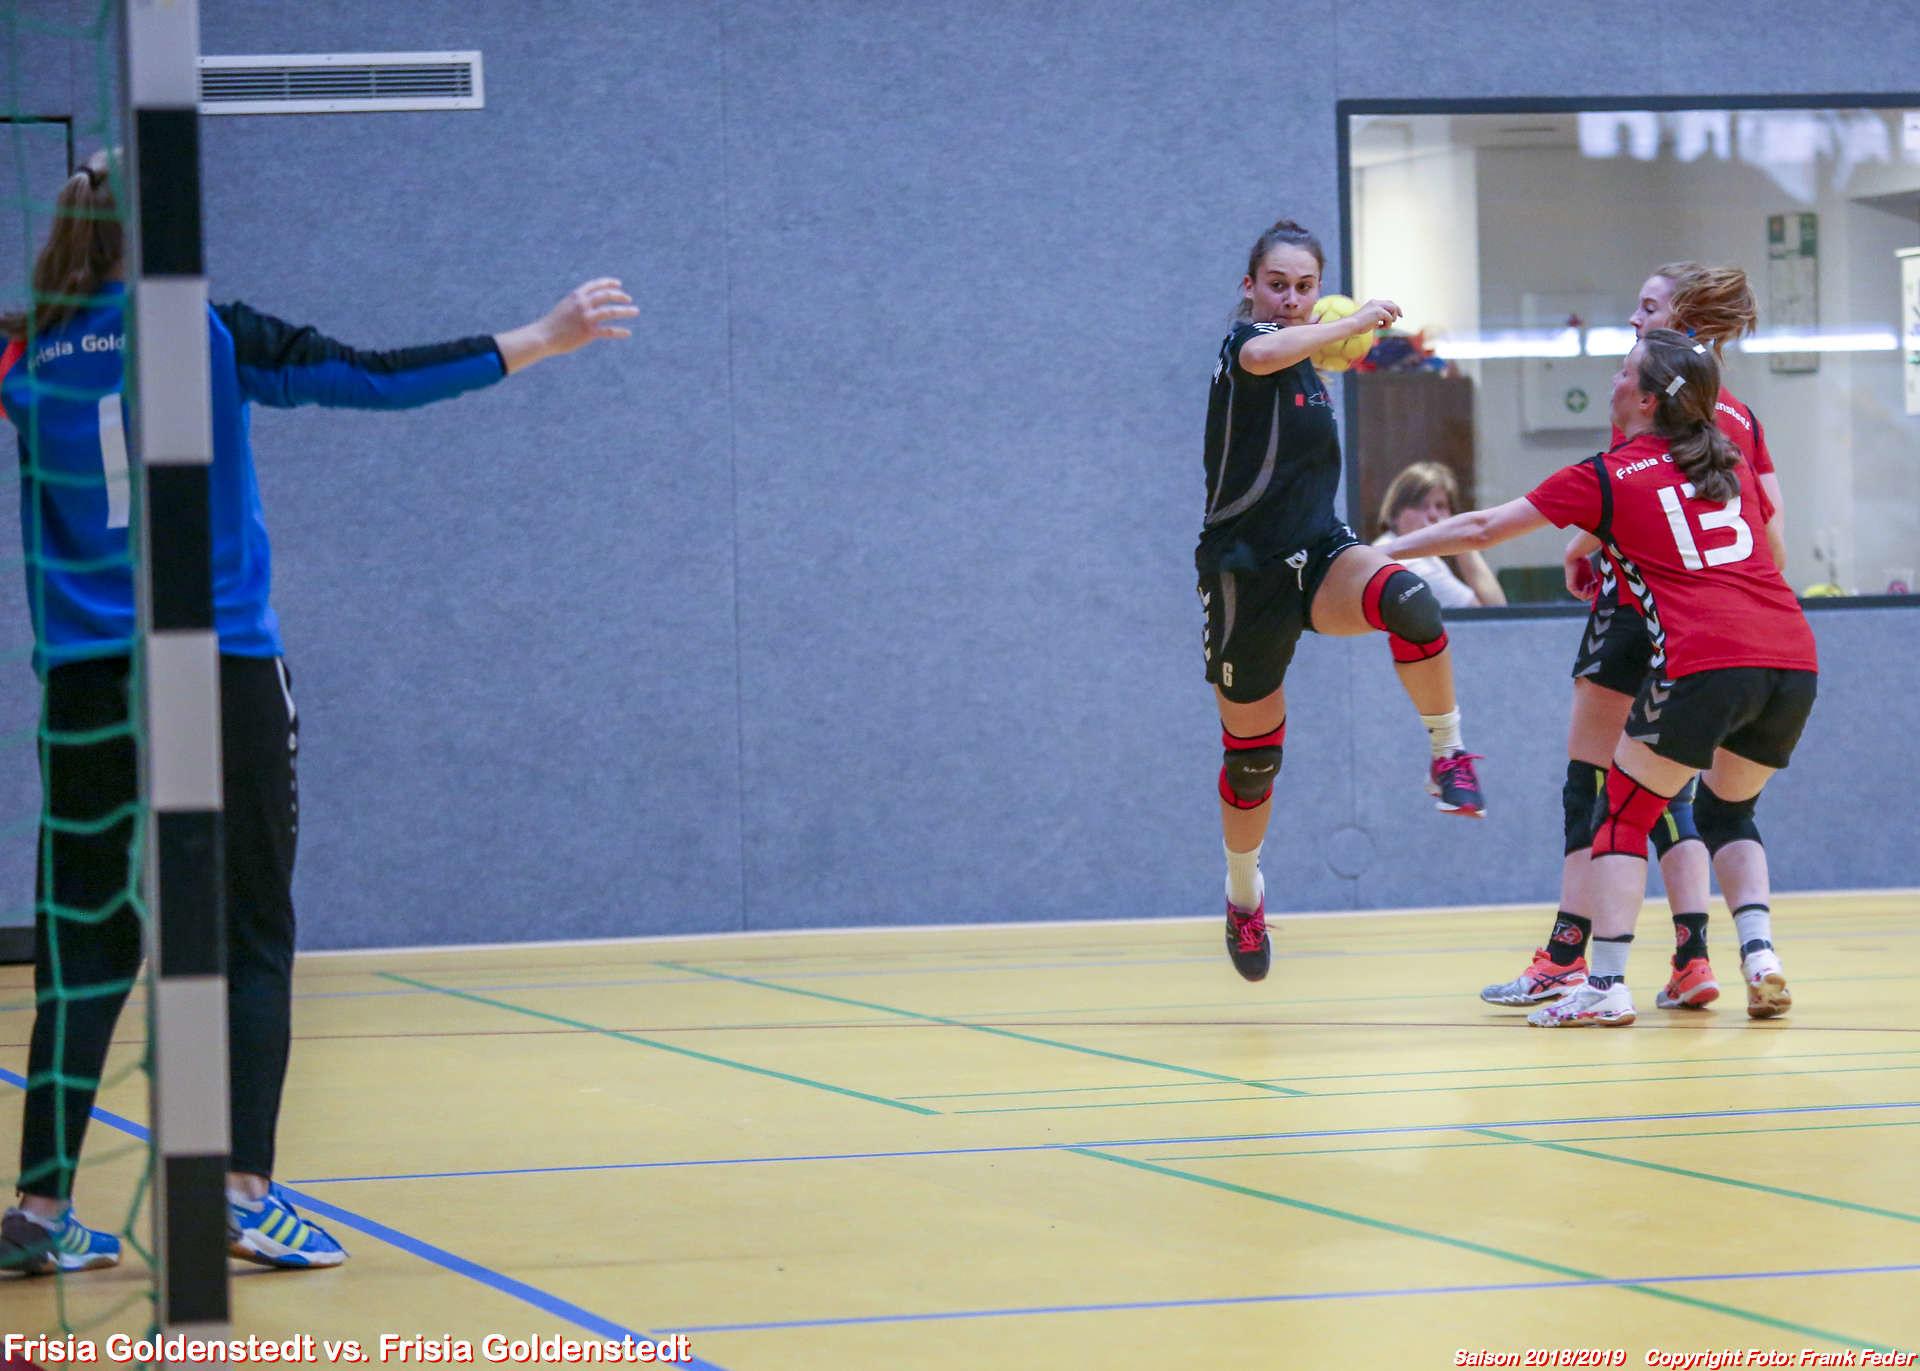 WEB_01-Frisia vs Frisia 2018_09_02_1753_090.jpg